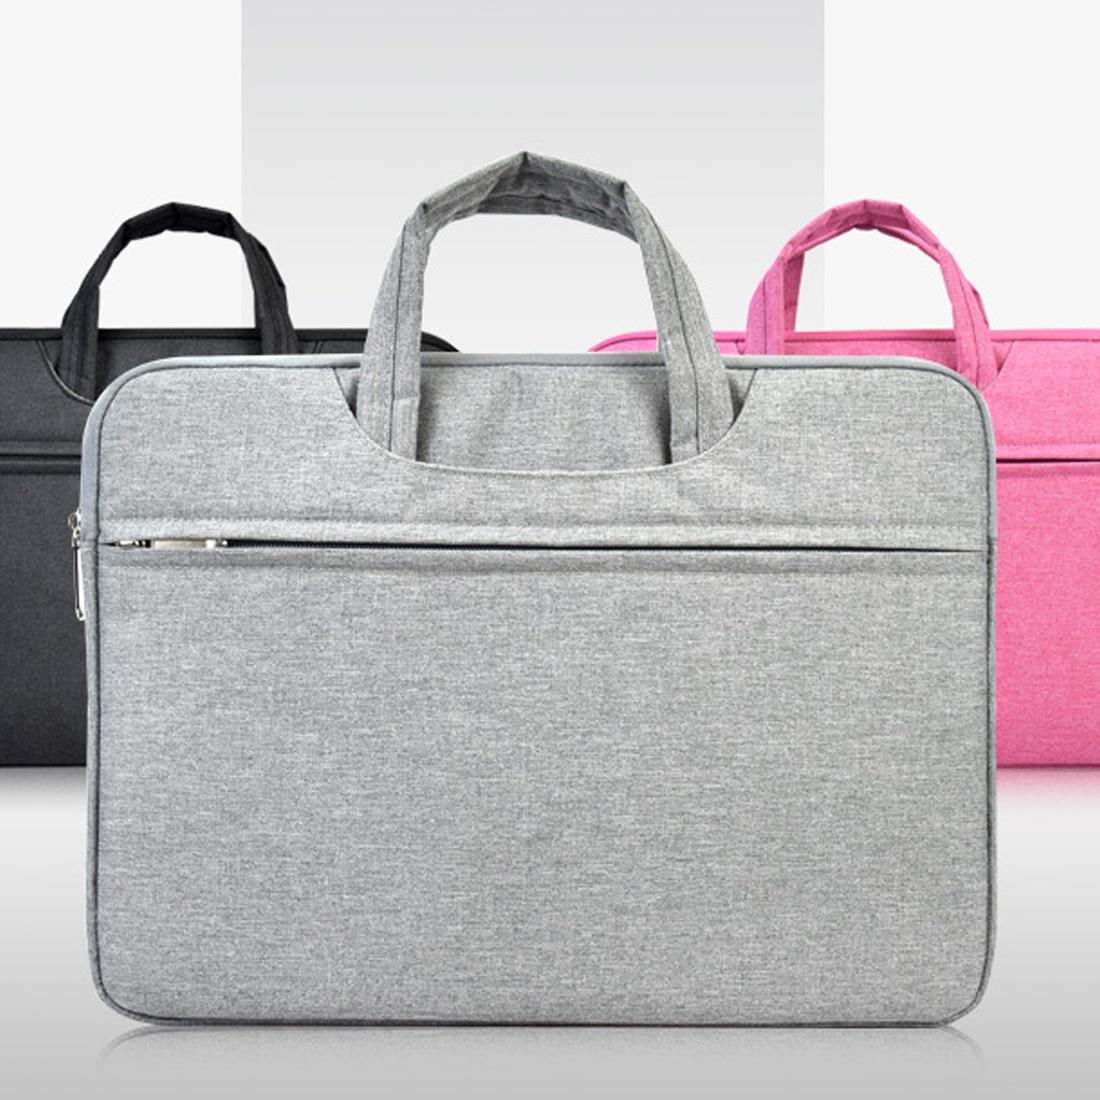 NOYOKERE 11.6 12 13 13.3 14 15 15.6 Inch bags  Computer Bags Laptop cases Notebook Tablet Bag unisex men women Durable